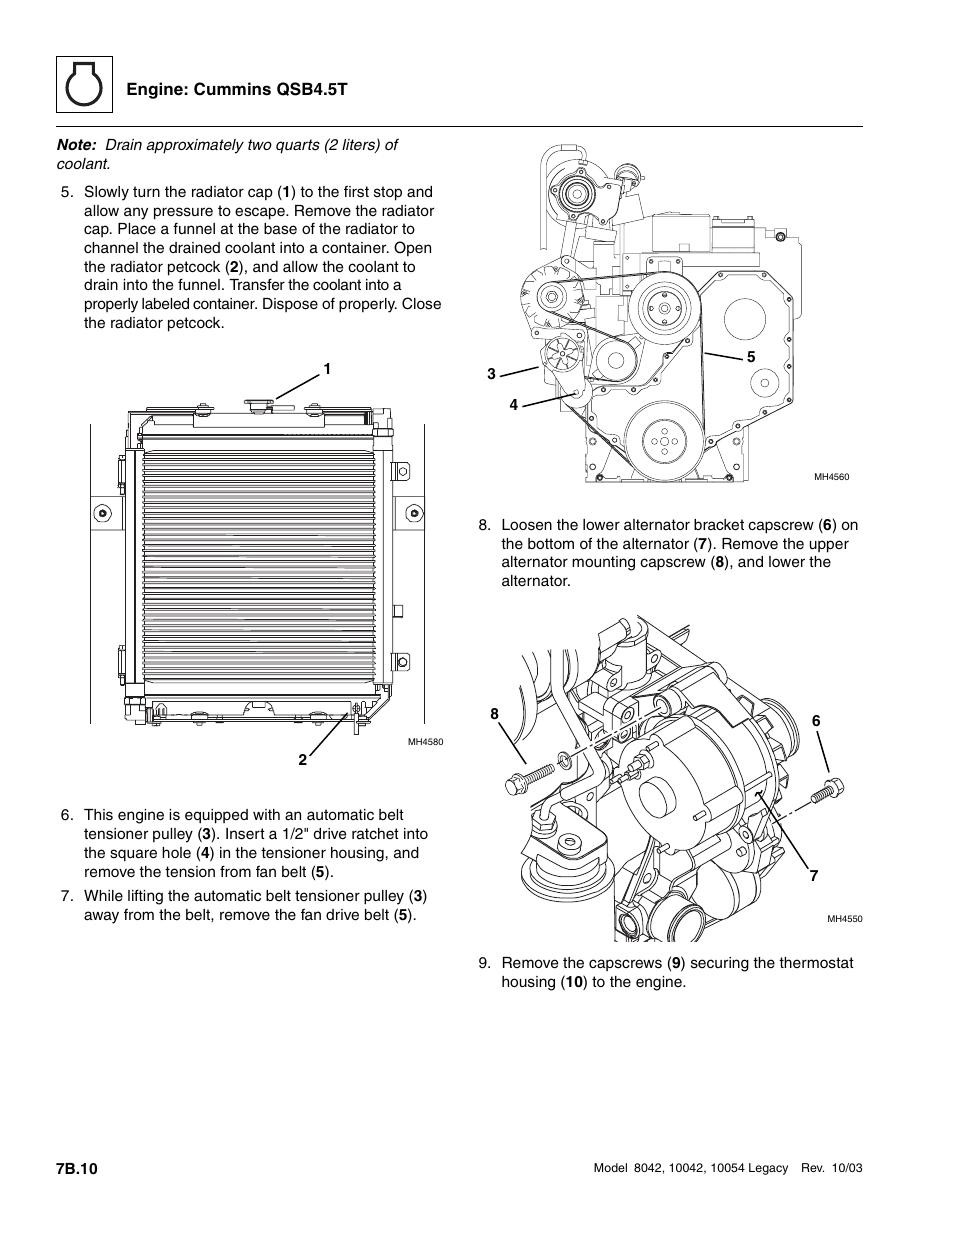 SkyTrak 8042 Service Manual User Manual | Page 377 / 906 | Also for: 10054 Service  Manual, 10042 Service Manual